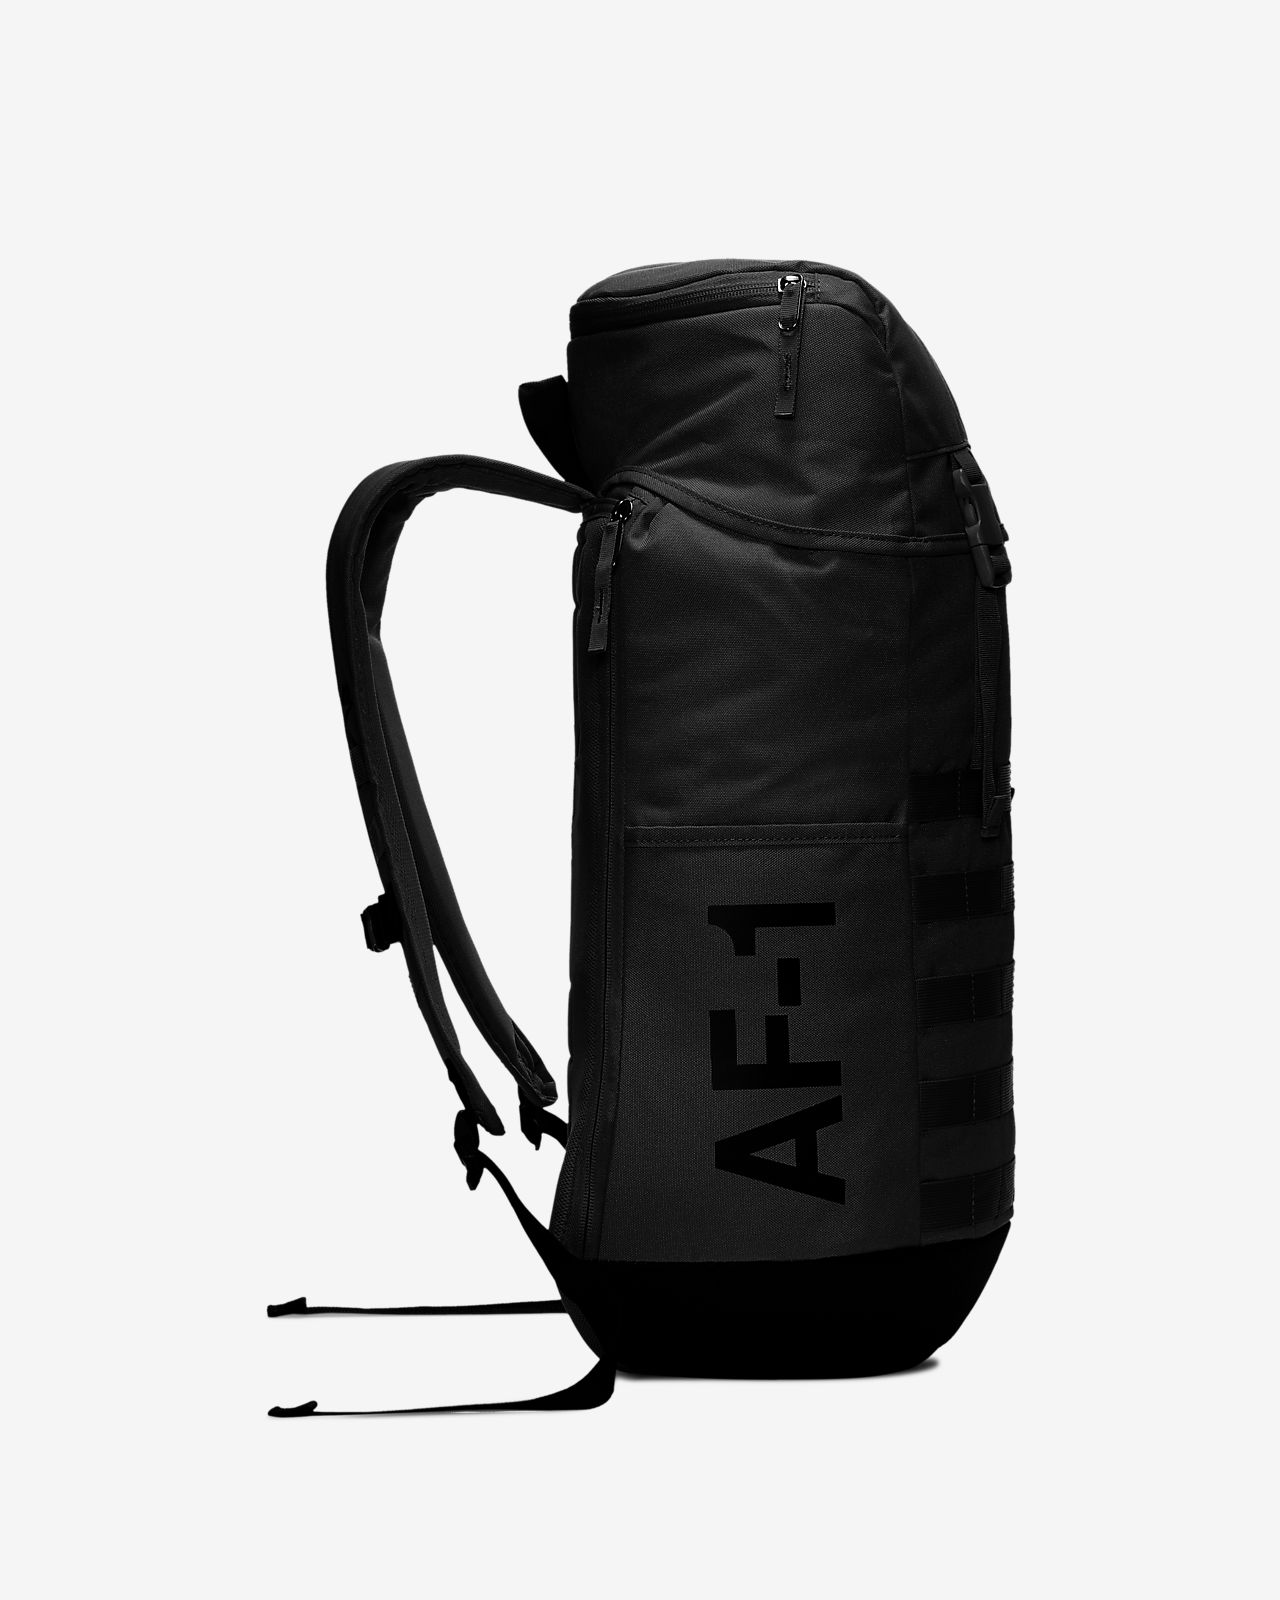 2aa679af87 Low Resolution Nike Sportswear AF1 Backpack Nike Sportswear AF1 Backpack